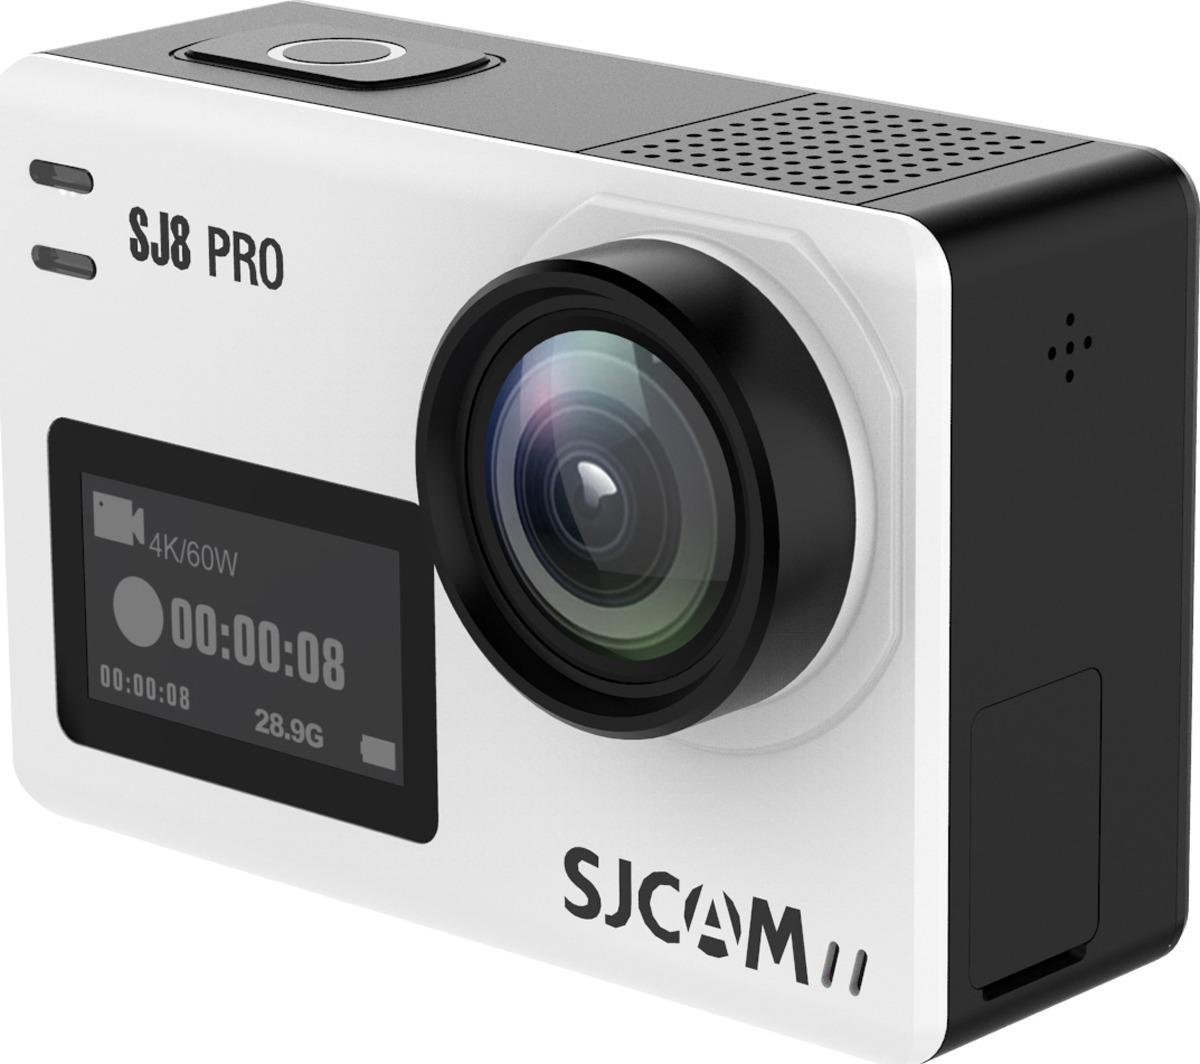 Экшн-камера SJCAM SJ8 Pro, SJ8 Pro (white), серебристый экшн камера sjcam sj8 pro черная